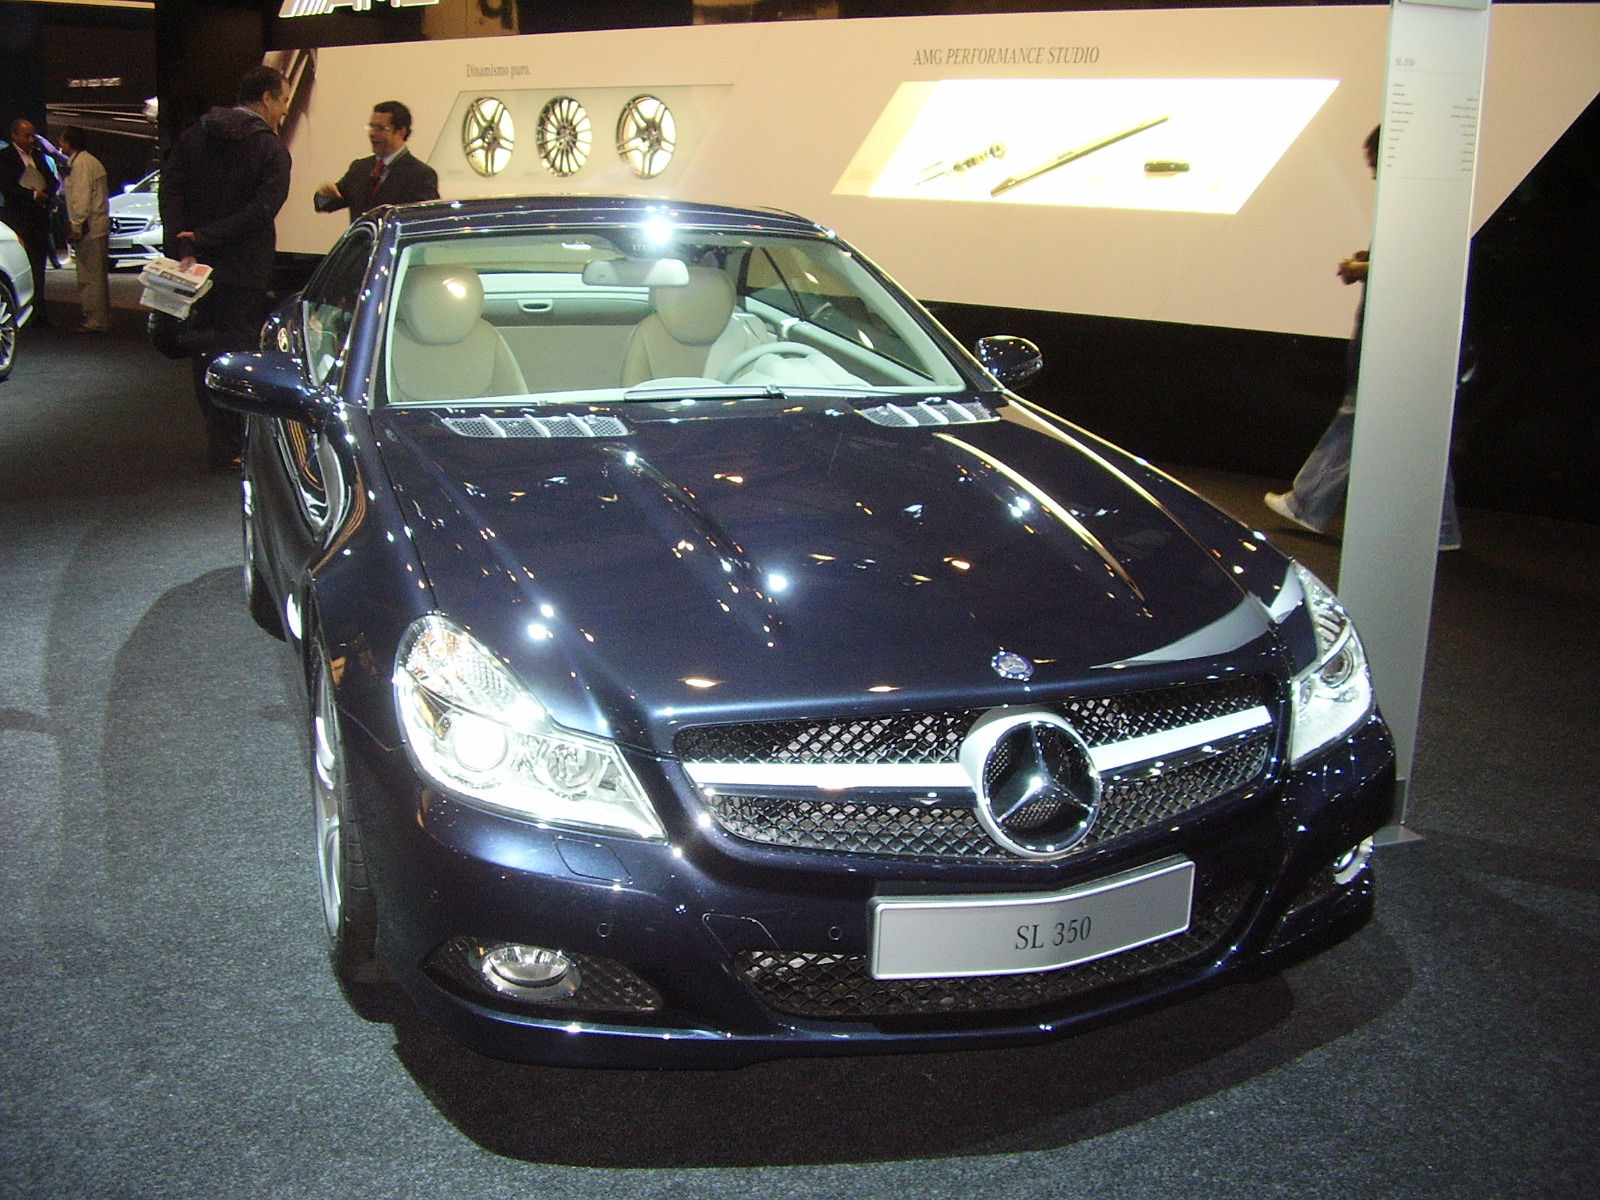 Visita Salon Automovil 09 BCN / Visit to Car Exhibition 09 Barcelona-P5140713.JPG